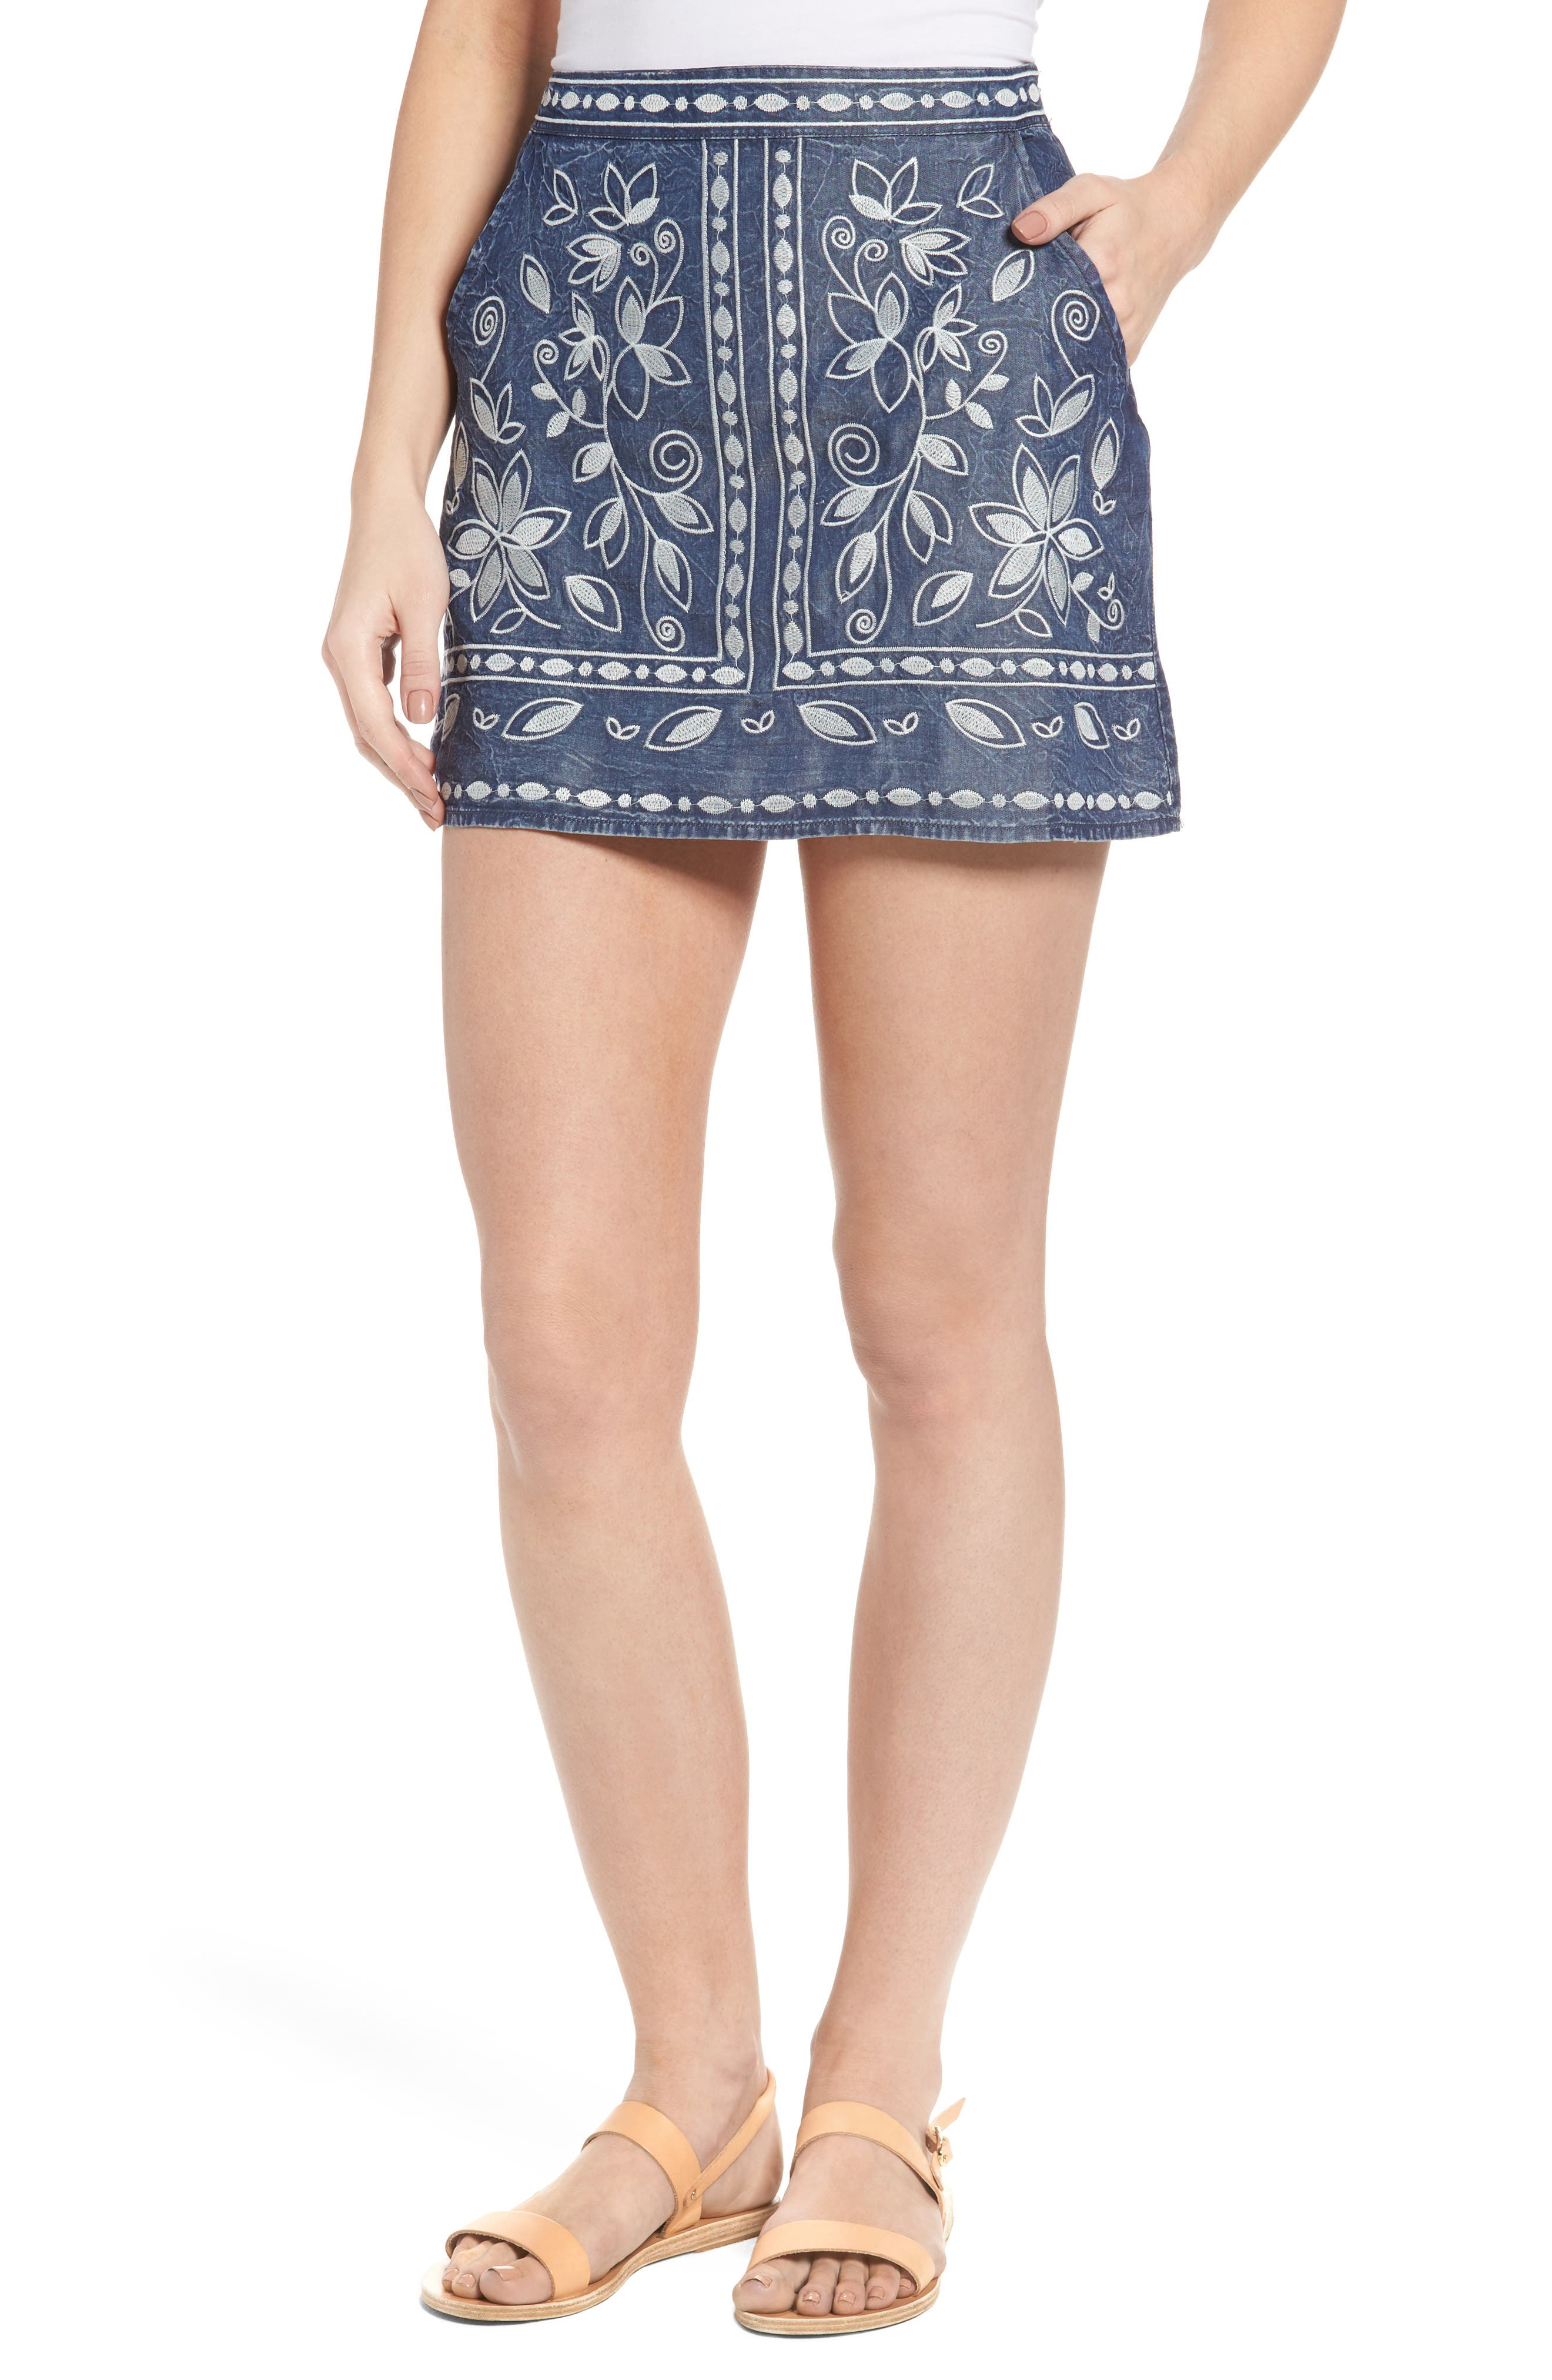 Chloe & Katie Embroidered Denim Miniskirt